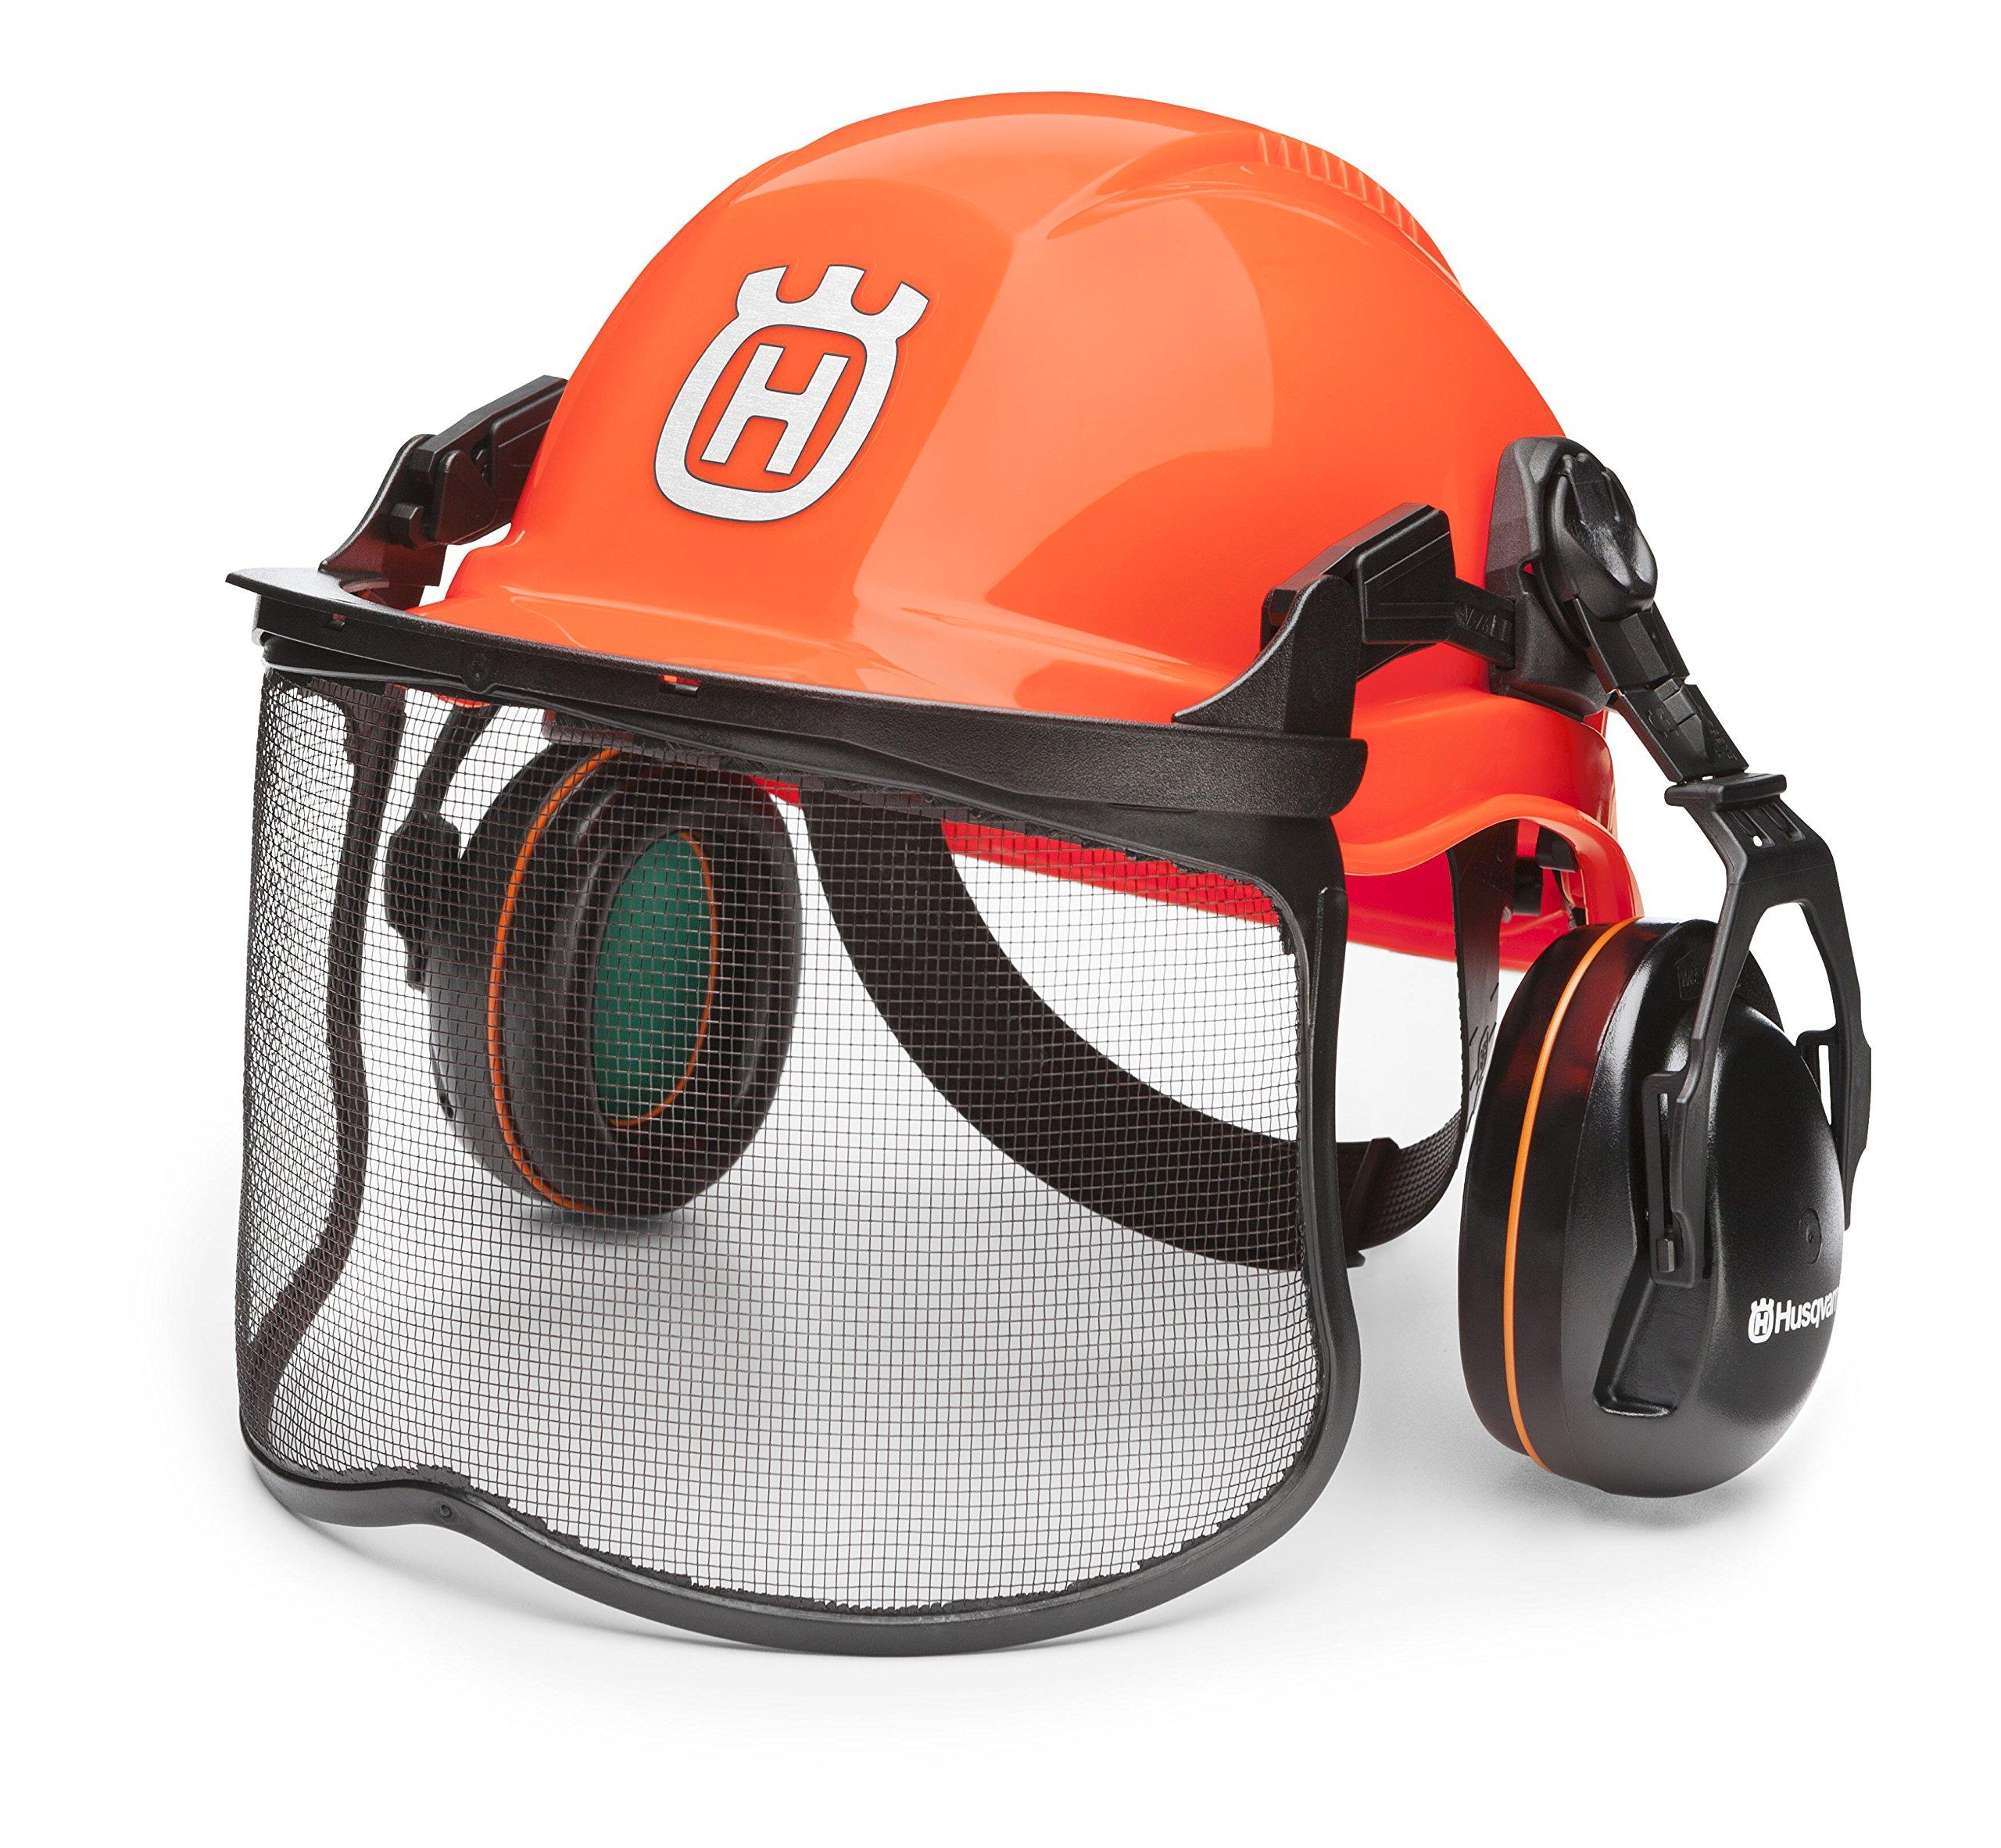 Husqvarna 592752601 Forest Head Protection Helmet by Husqvarna